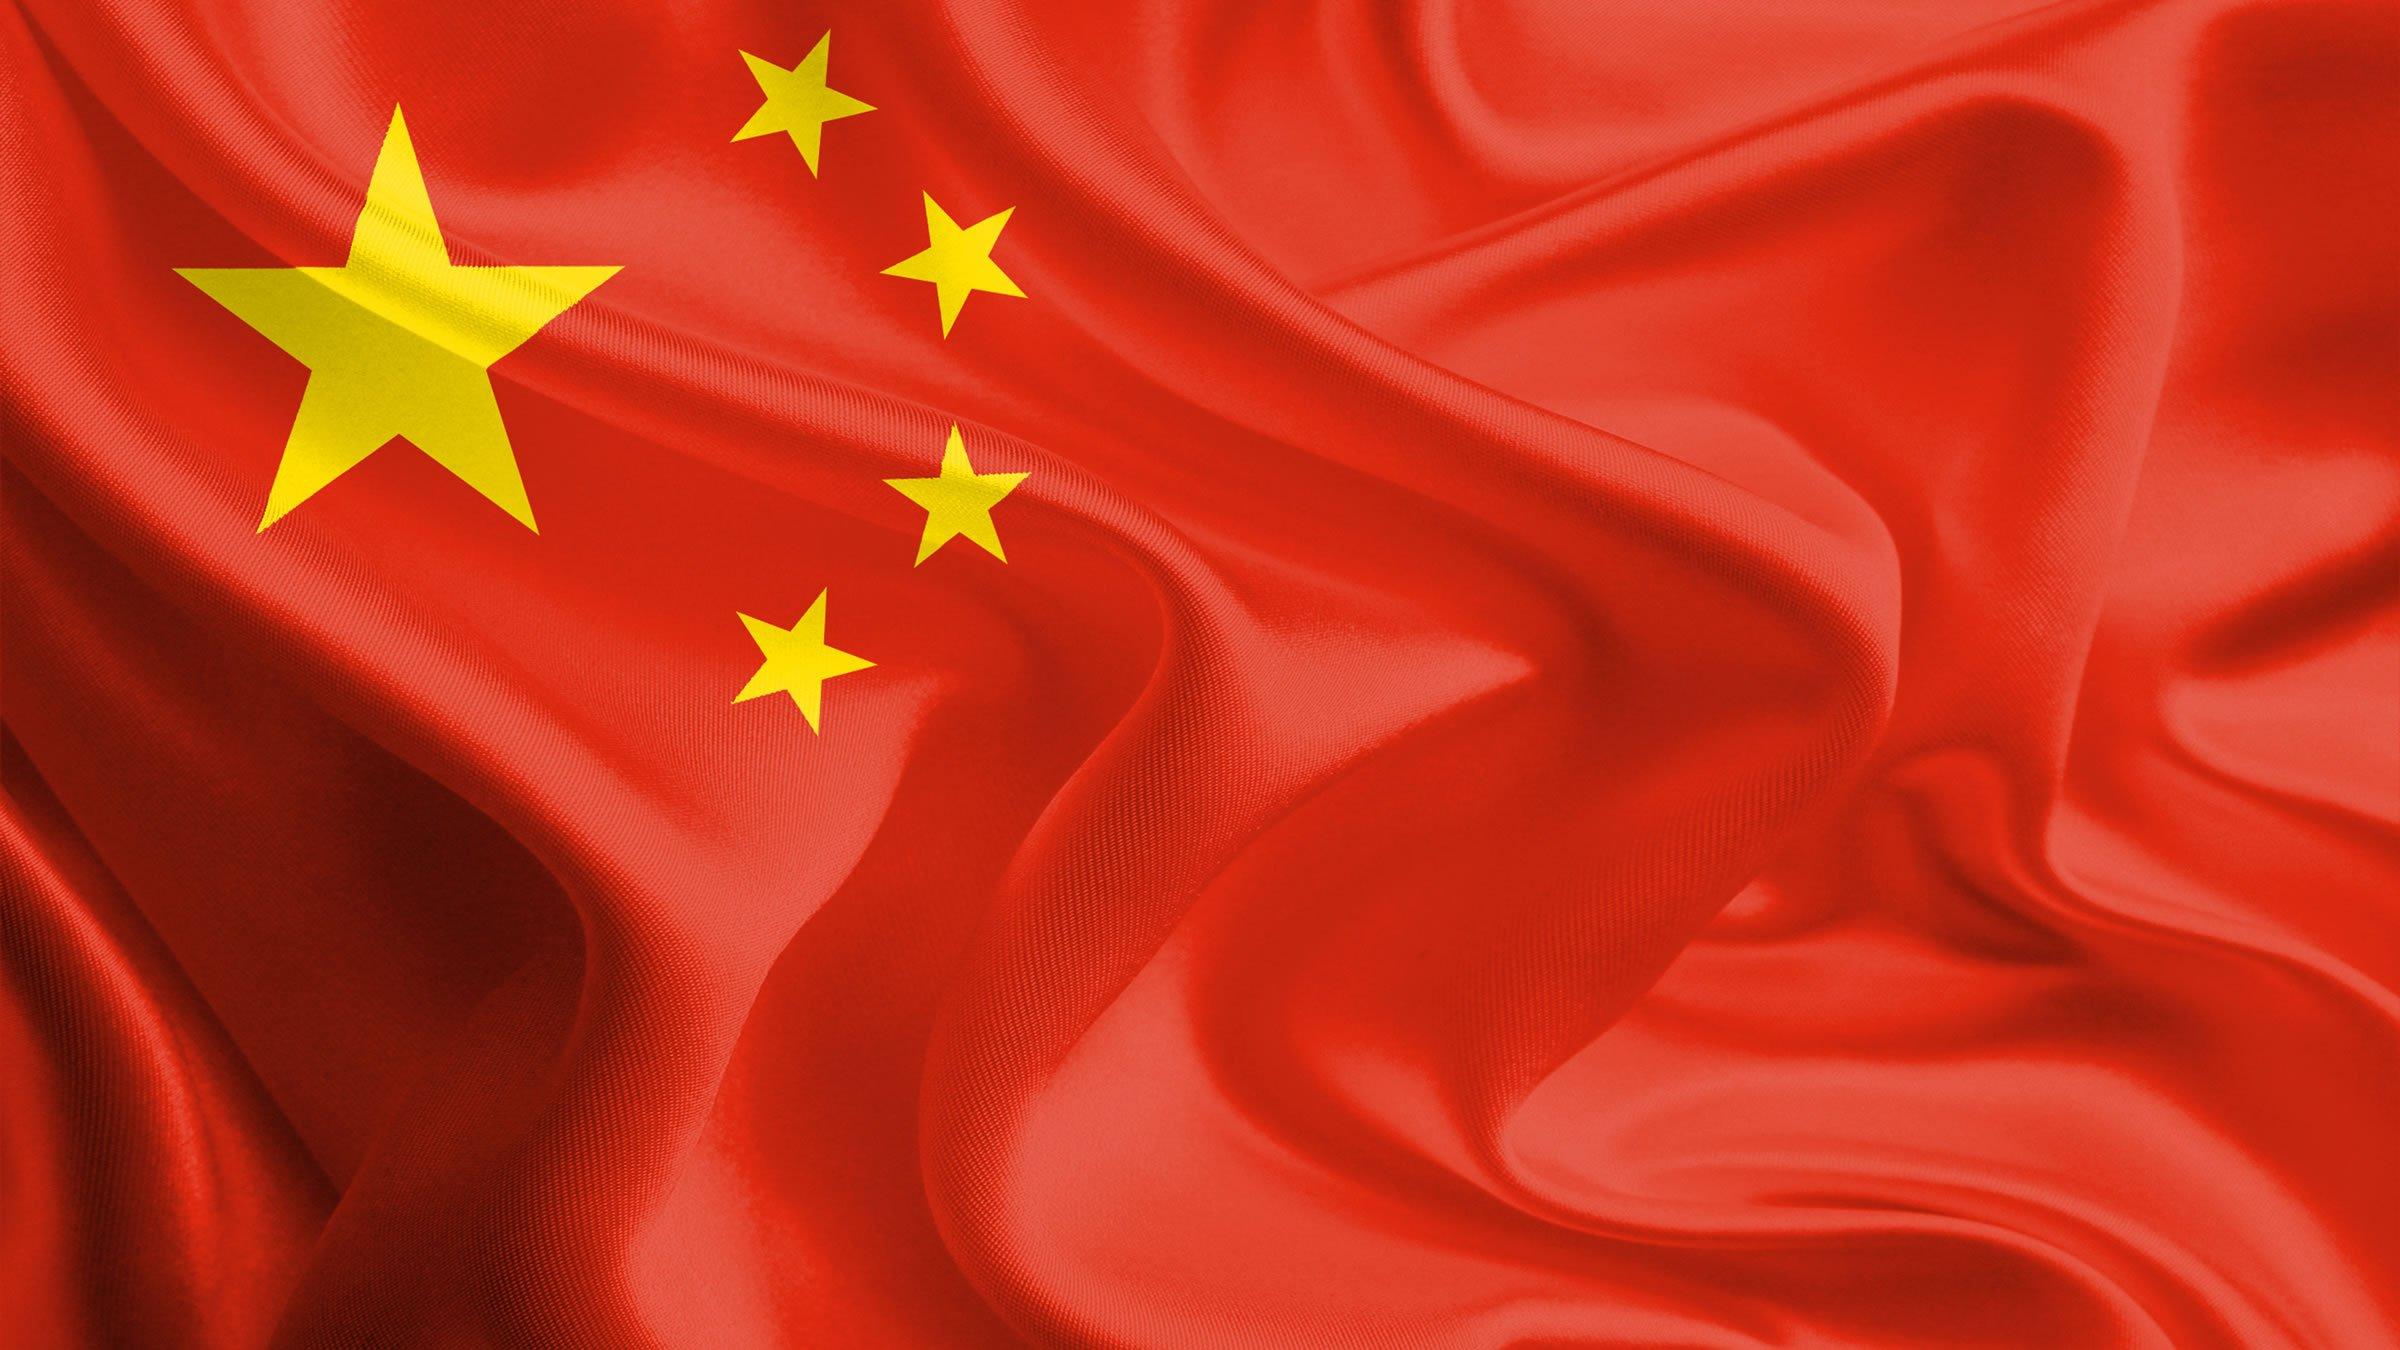 Por qu es roja la bandera de china - Que dias dan mala suerte en la cultura china ...